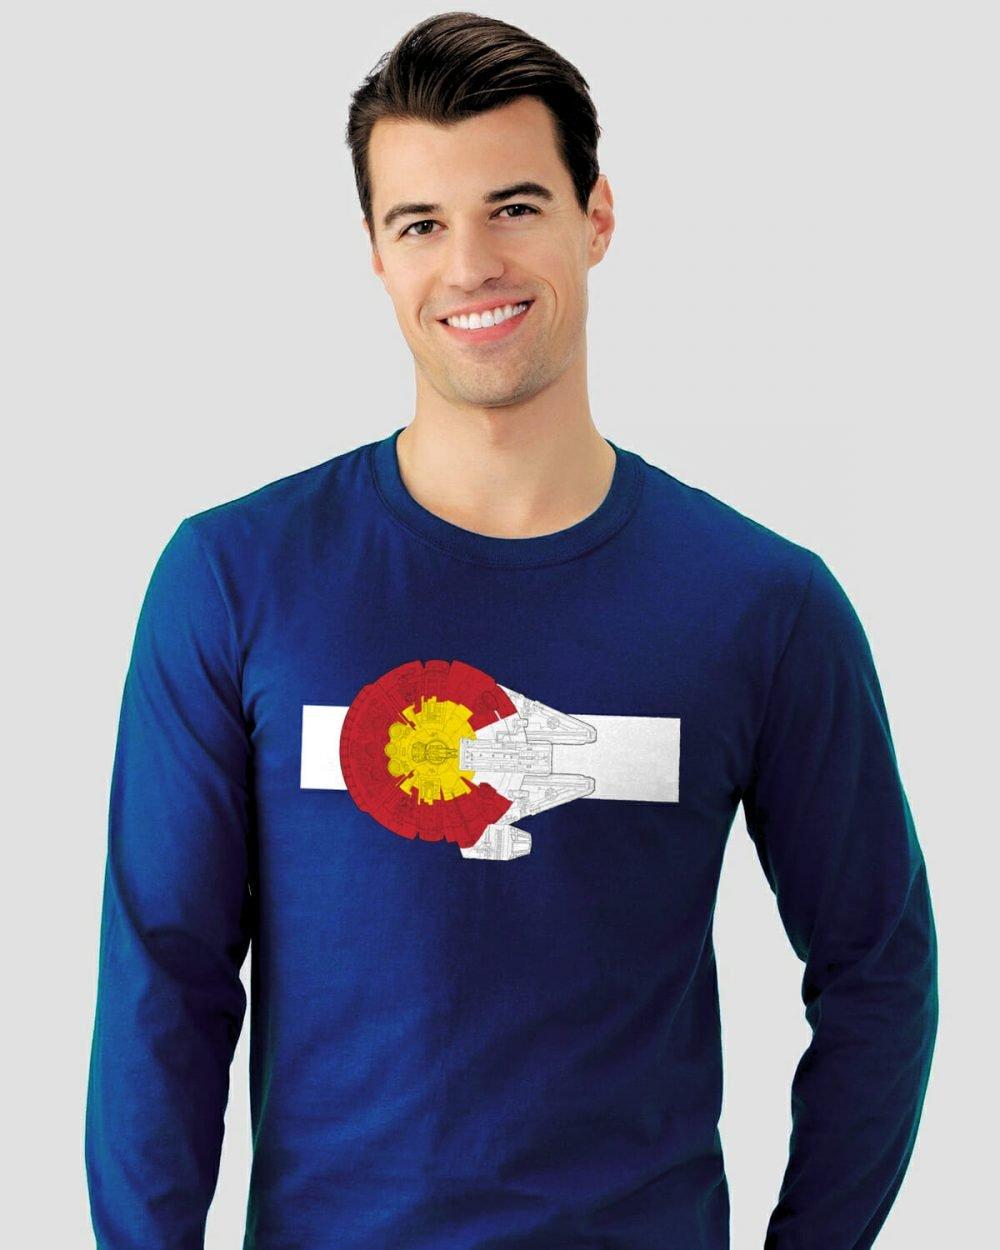 Colorado Millennium Falcon longsleeve